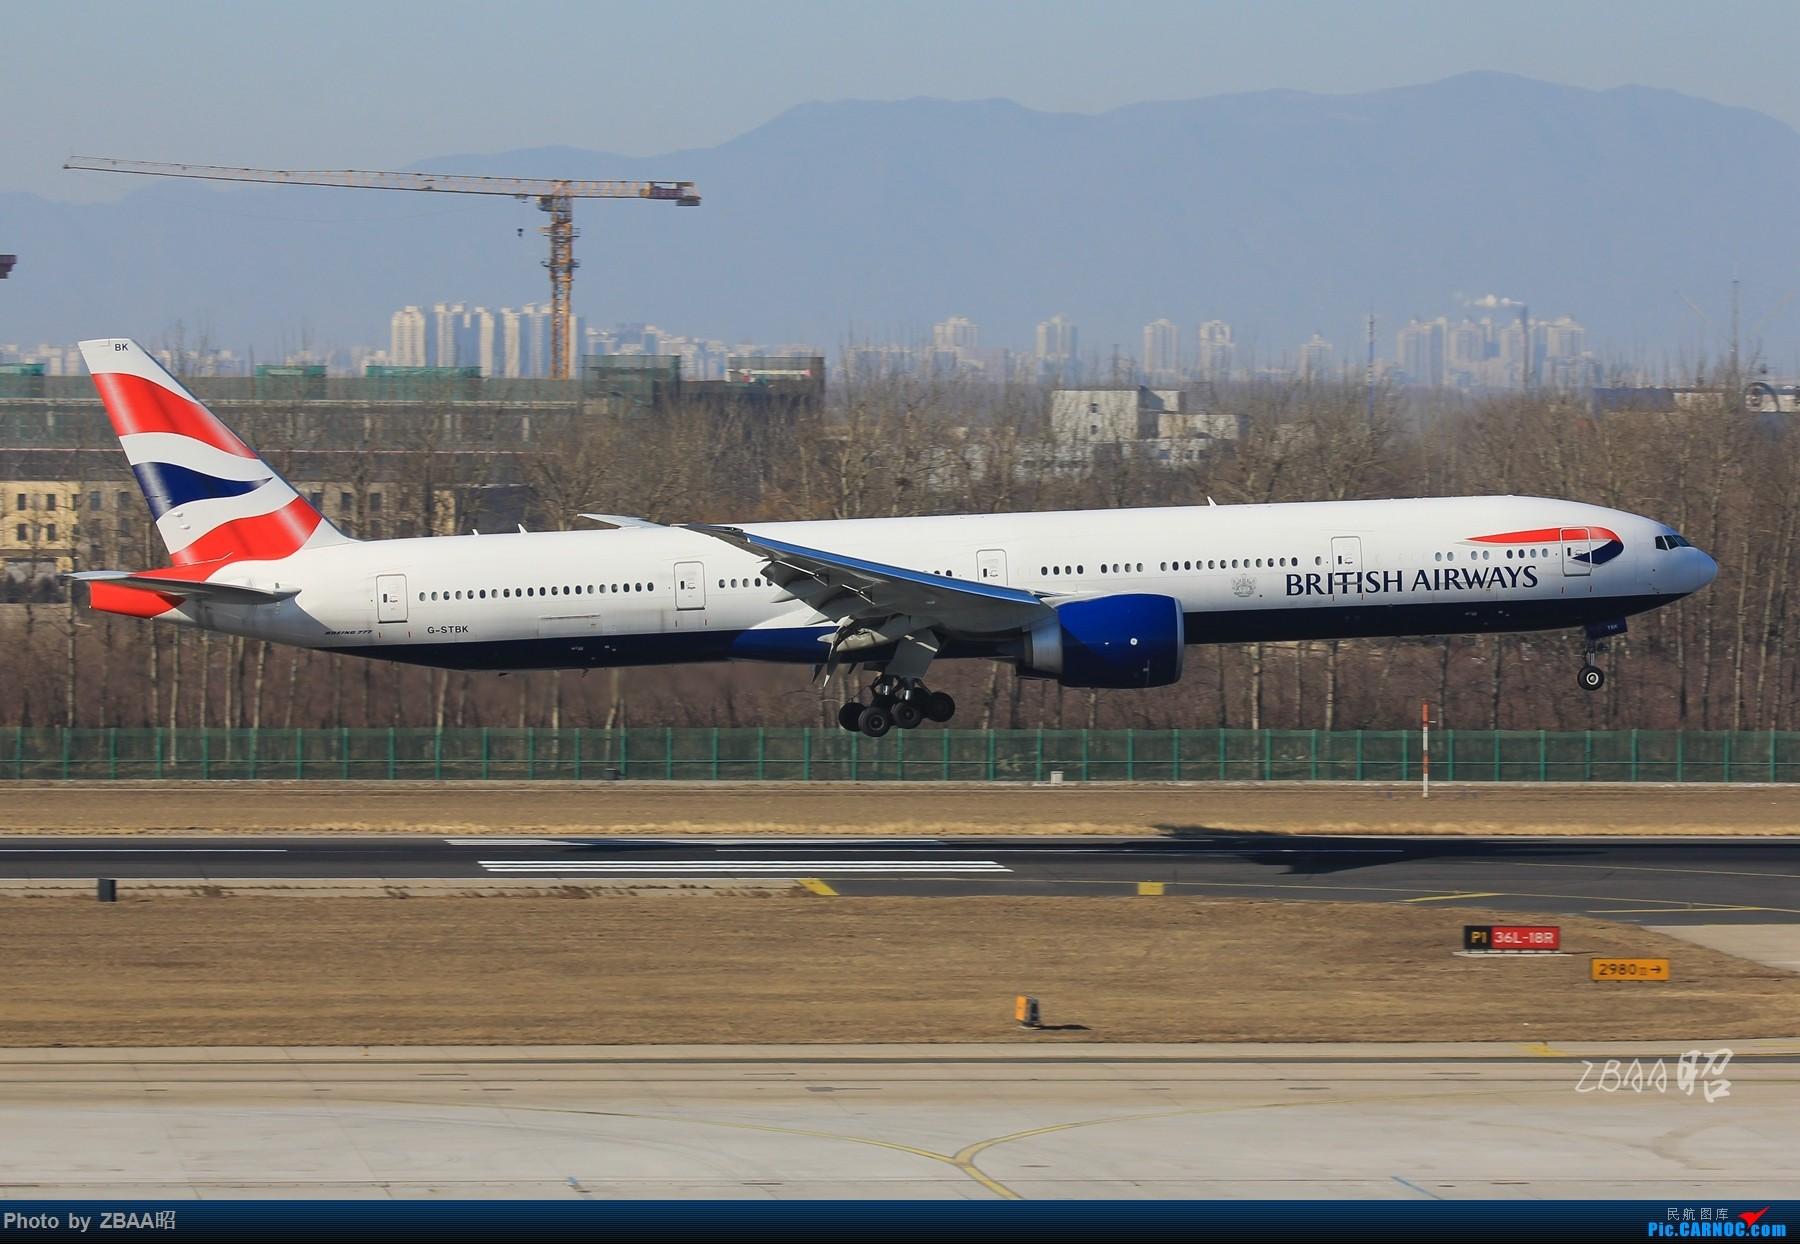 Re:[原创]飞友聚会后的独自疯狂,格林豪泰隔天怒打ZBAA 36L跑道,夜拍海航宽体机,寒风中坚守楼顶阵地 BOEING 777-300ER G-STBK 中国北京首都国际机场